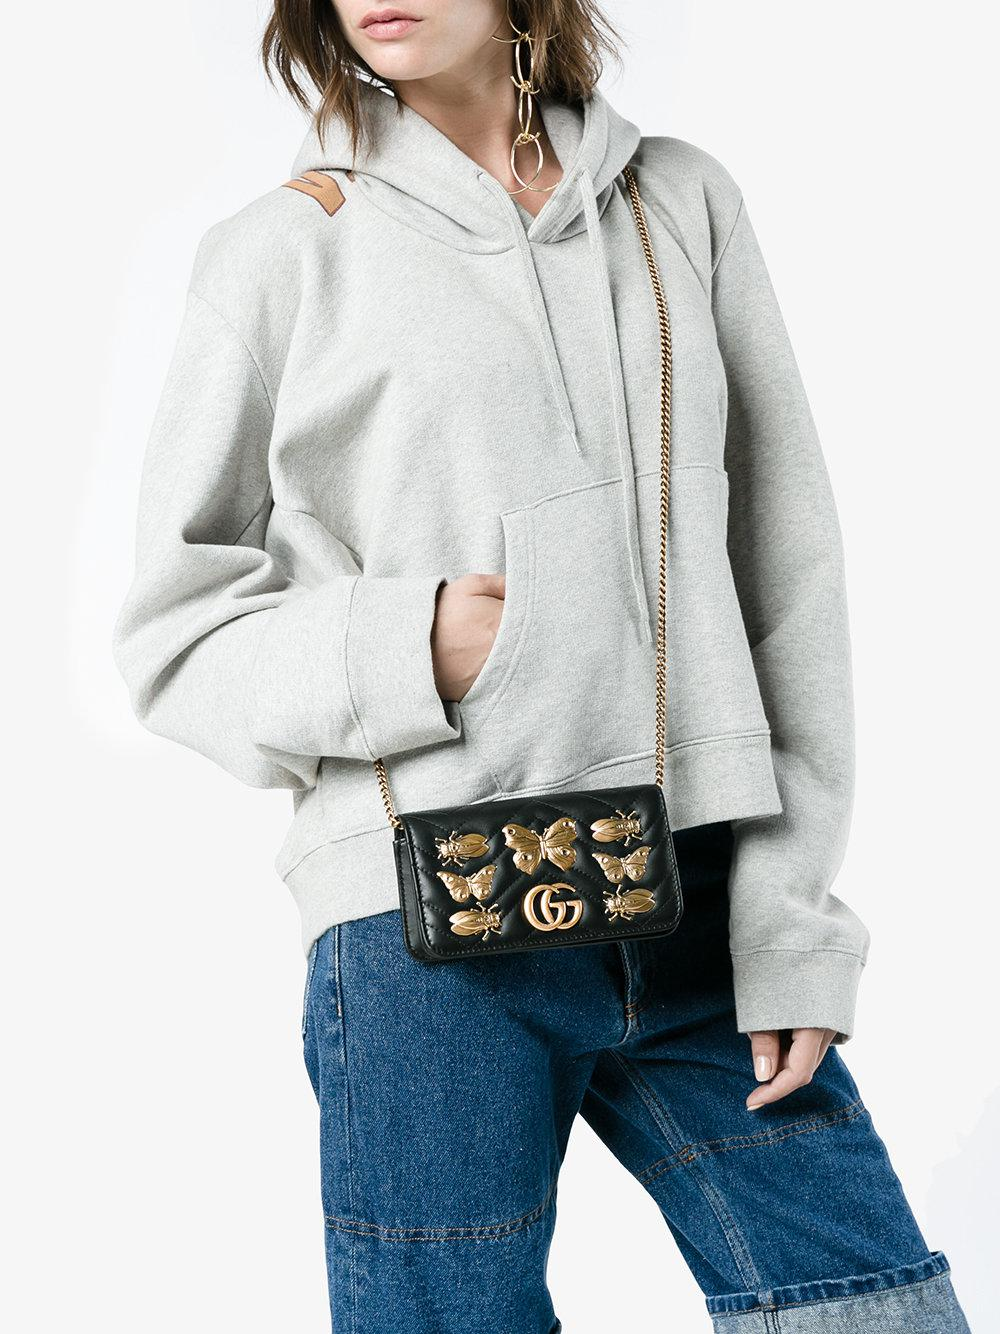 d997ea8264d47d Gucci Gg Marmont Bug Embellished Chain Wallet Bag in Black - Lyst